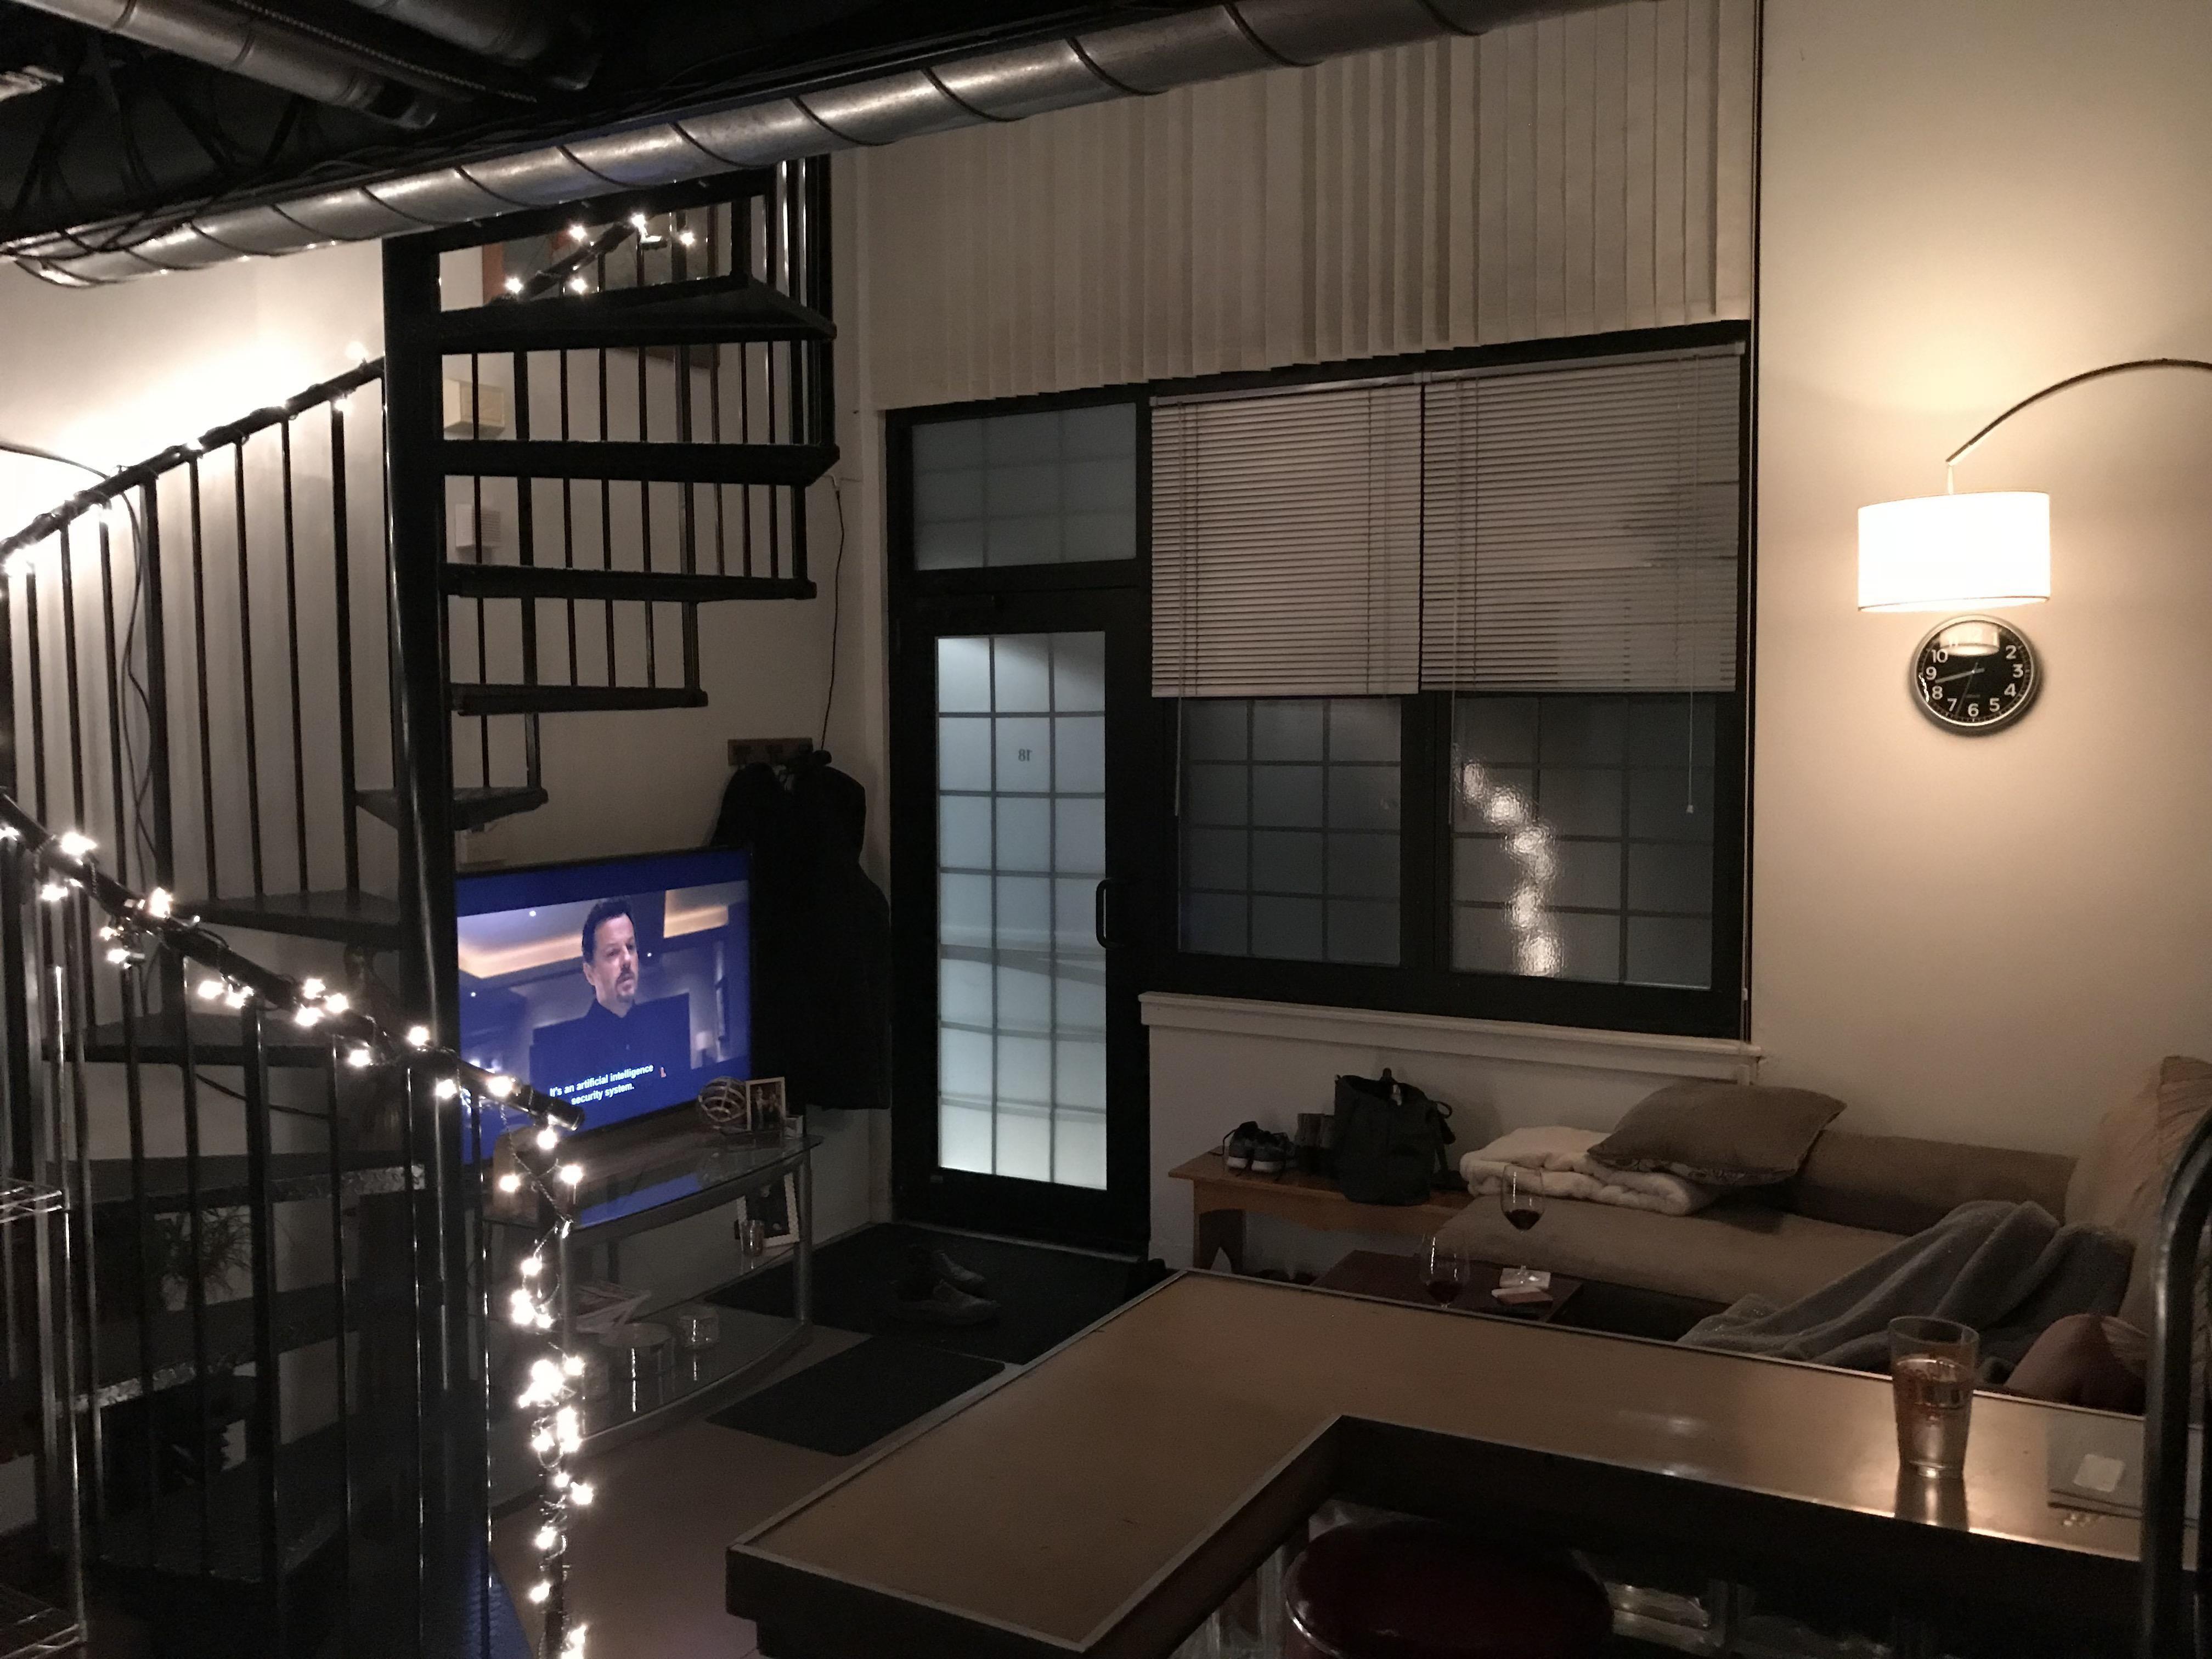 Wine & TV in my cozy loft apartment http://ift.tt/2CQtZBT ...